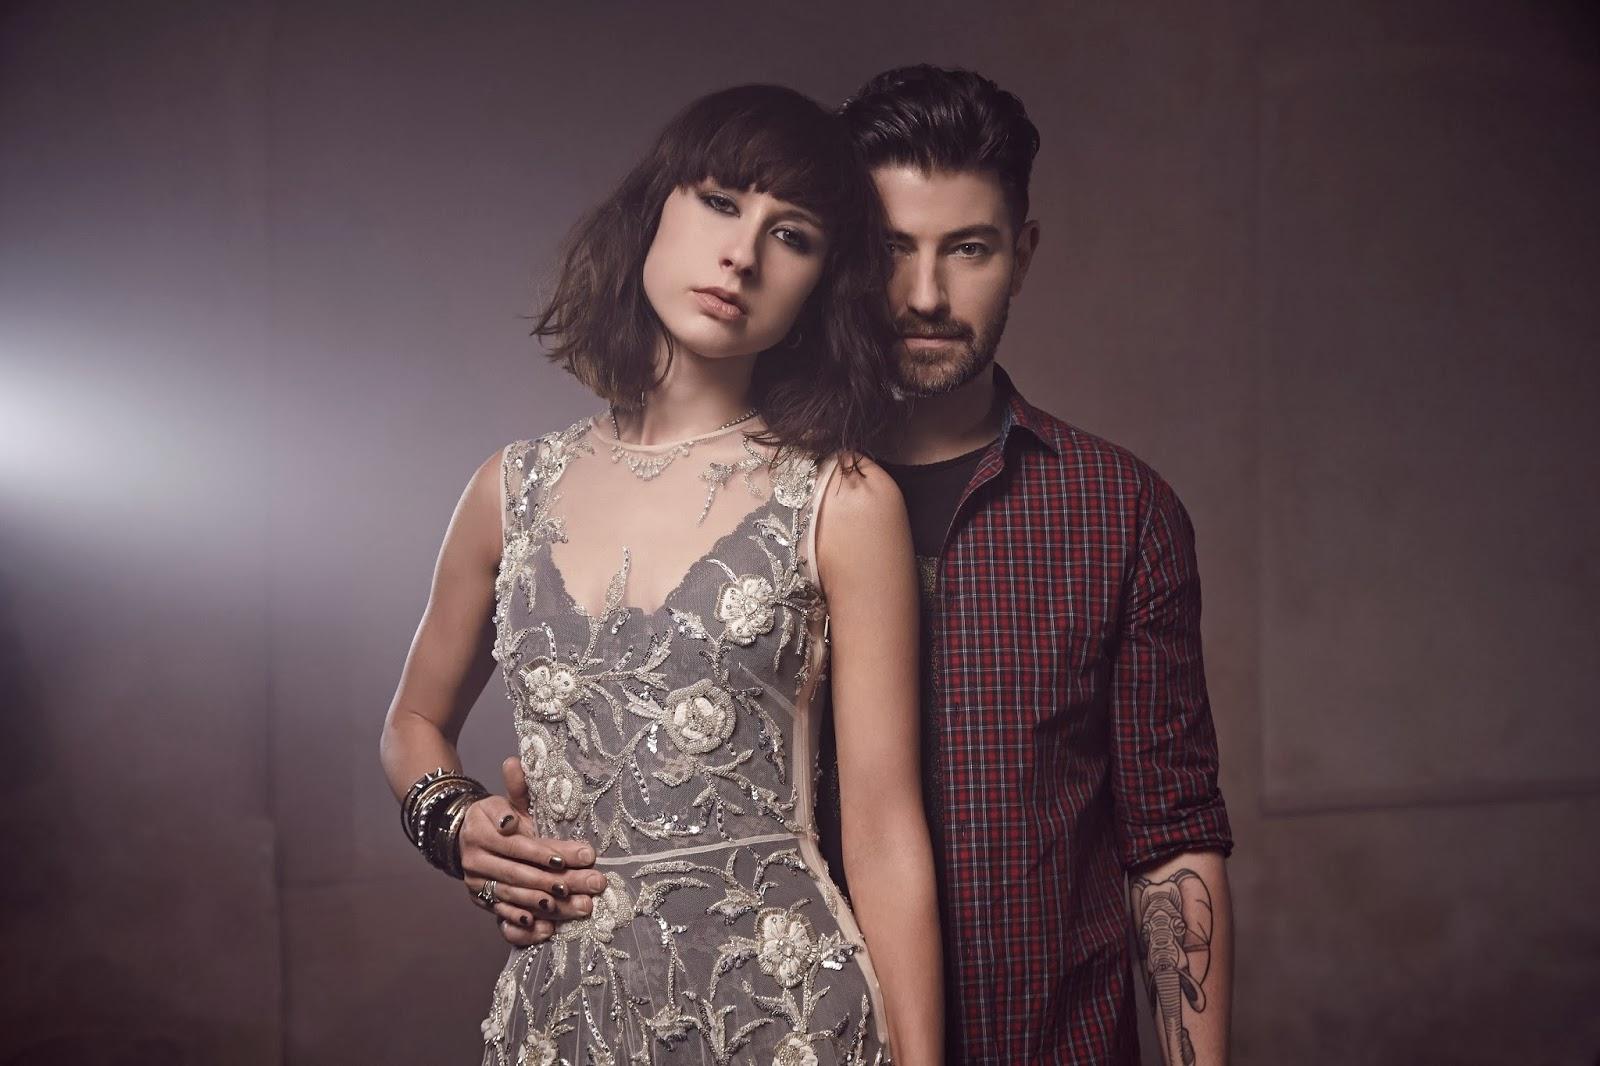 I Am A Camera release latest single Lost In Love